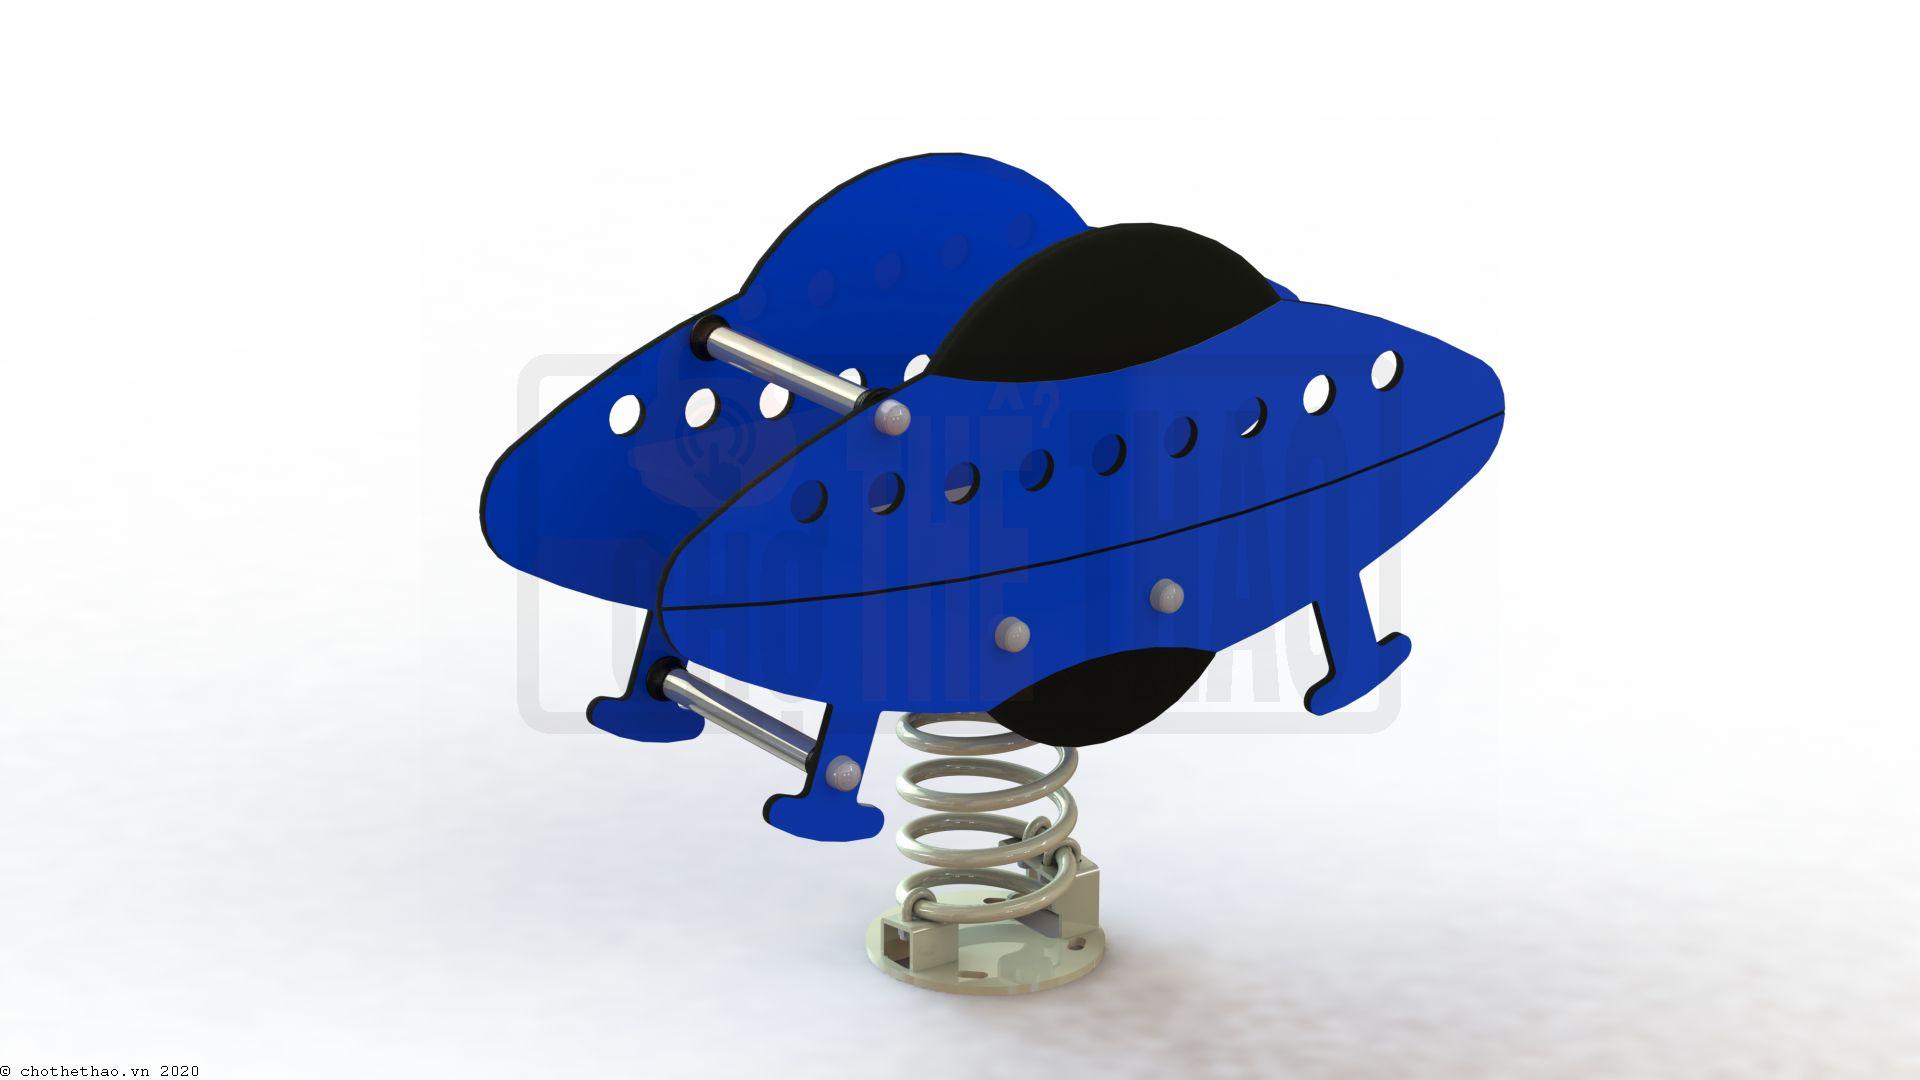 Thú nhún lò xo 2 tấm đĩa bay NIK731513-UFO